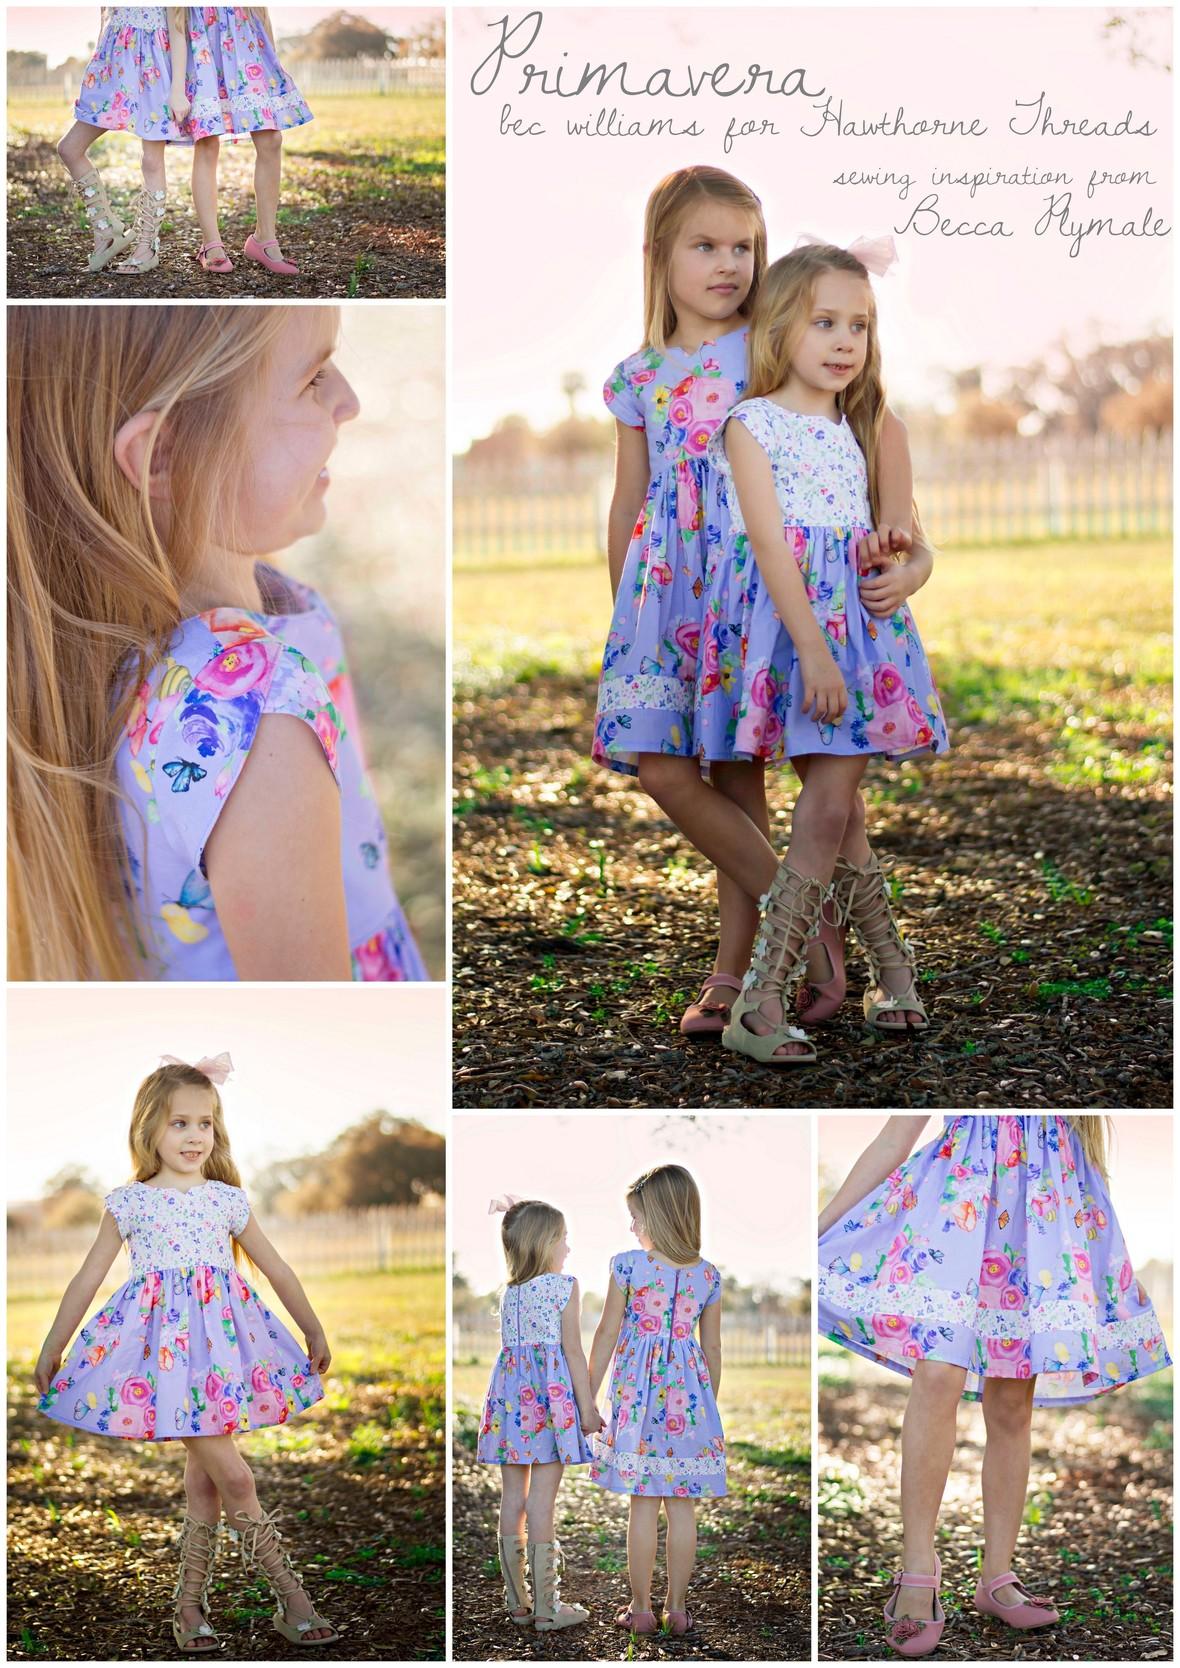 Becca Plymale Primavera Fabric Dresses for Hawthorne Threads